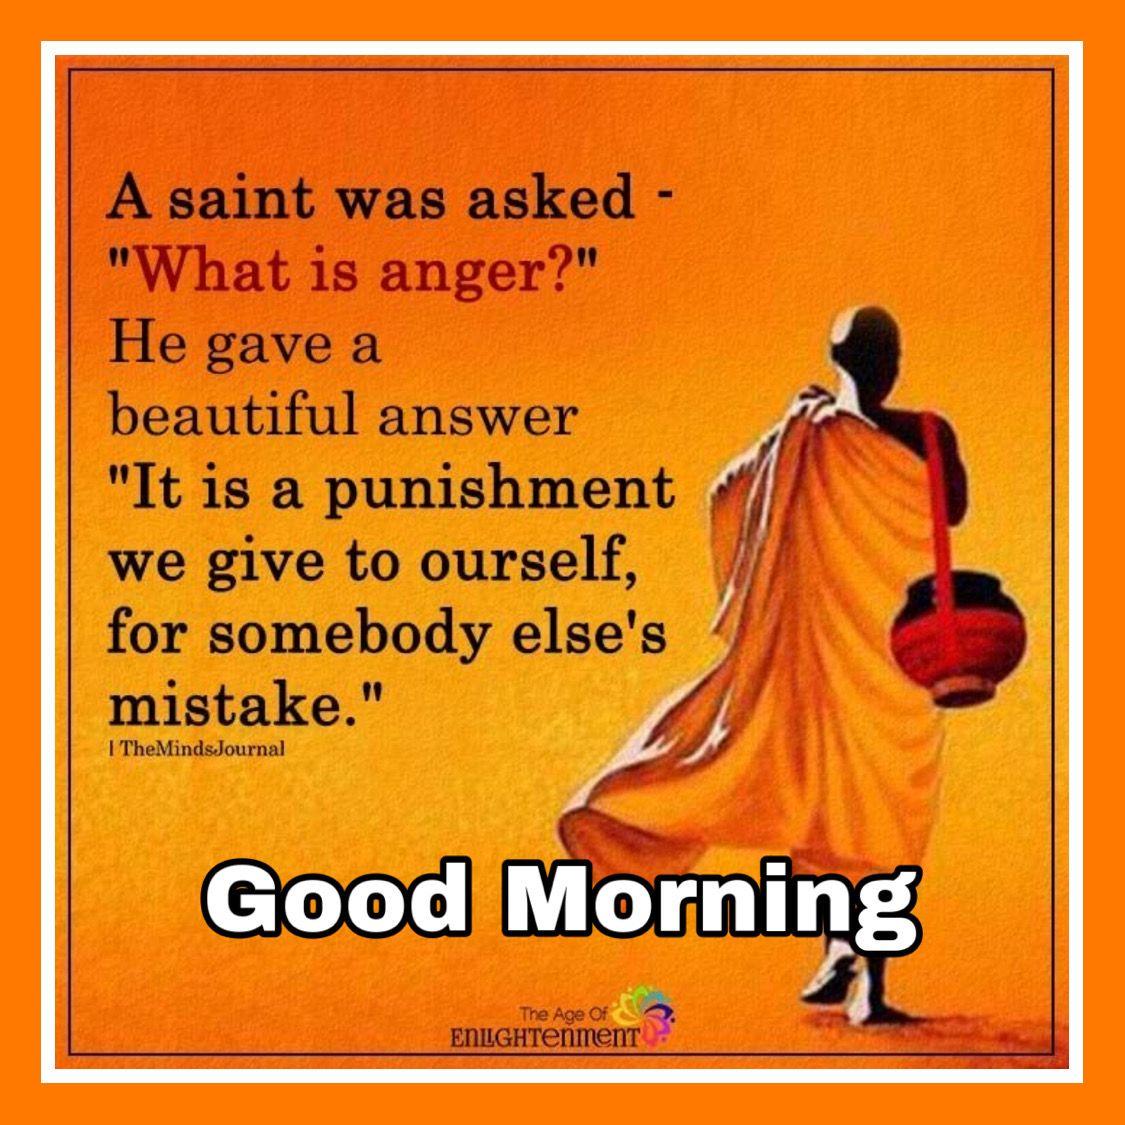 Pin By Praveen Bansal On Good Morning Good Morning Quotes Good Morning Inspirational Quotes Morning Inspirational Quotes